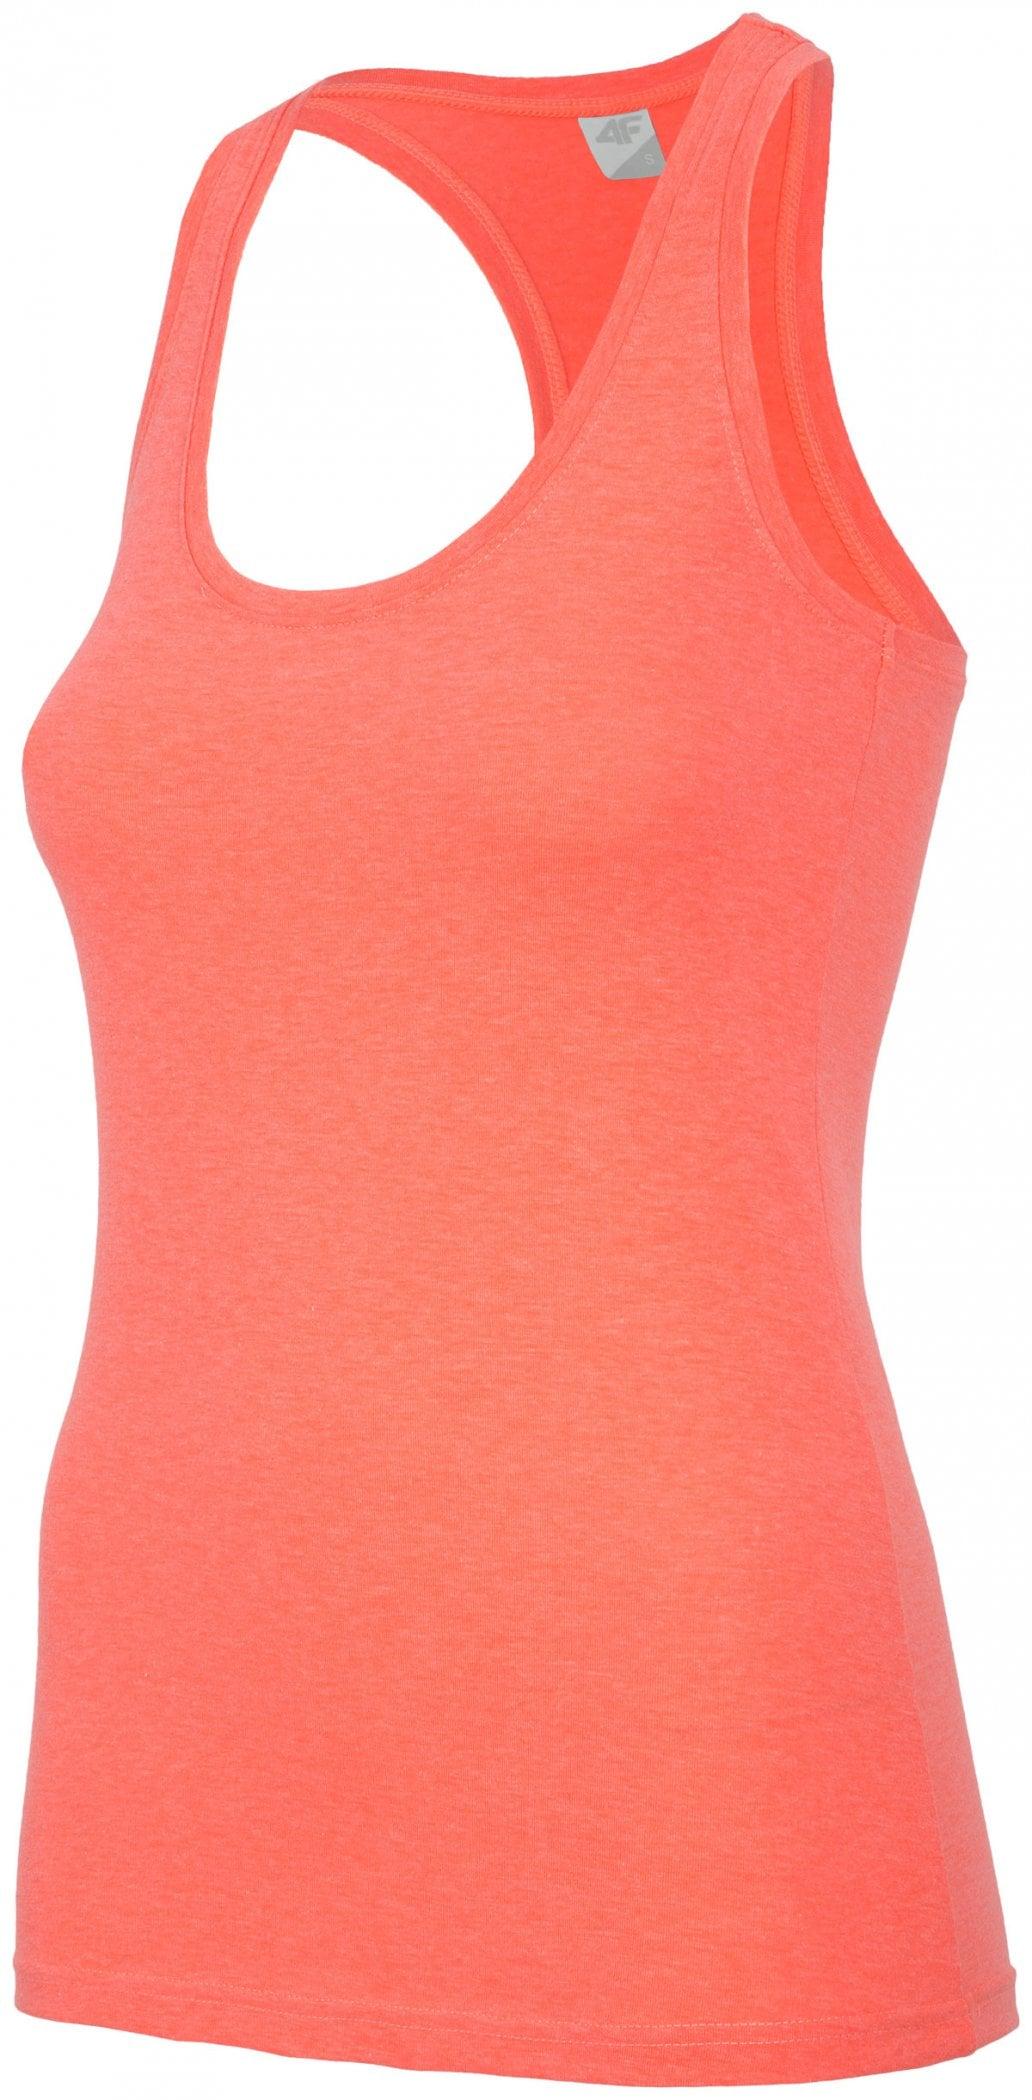 Koszulka bez rękawów damska TSD001- neon koral